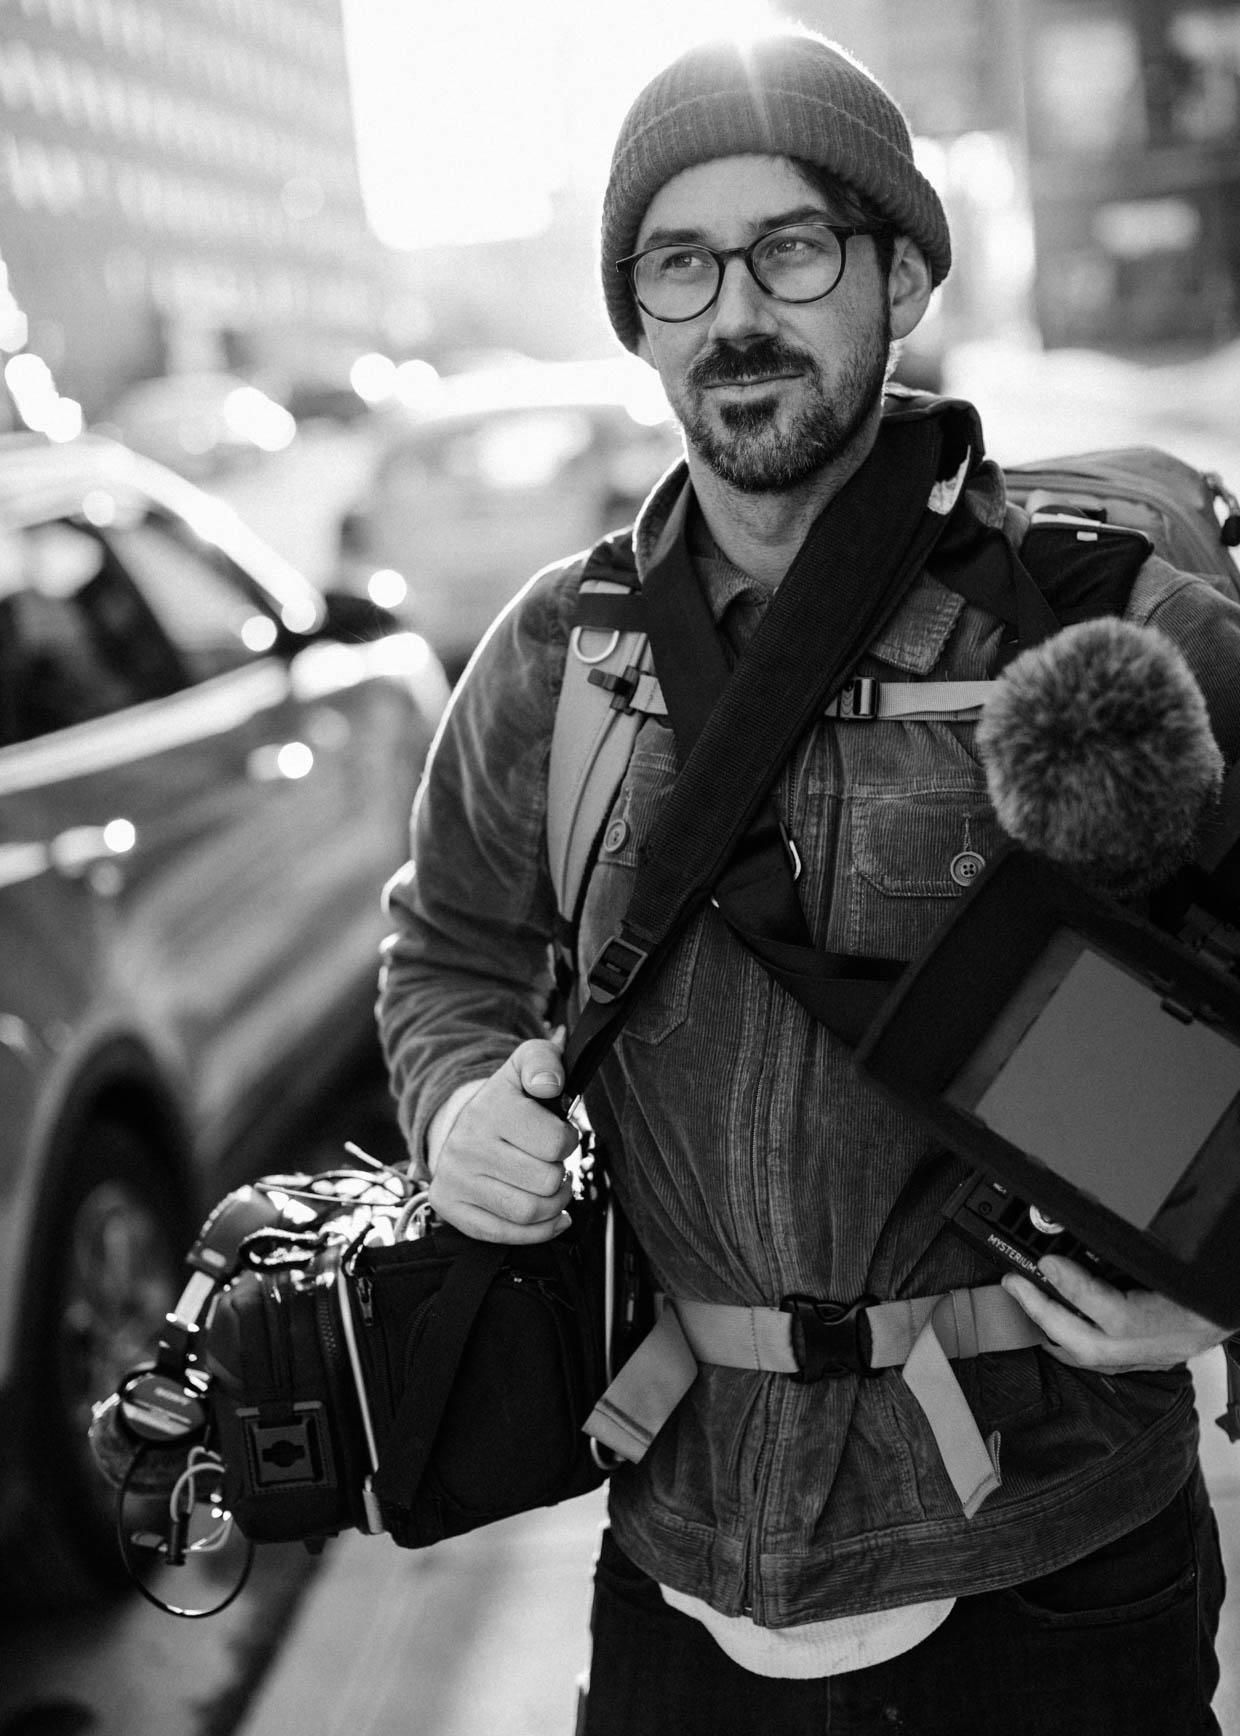 JUSTIN TAYLOR SMITH - Director